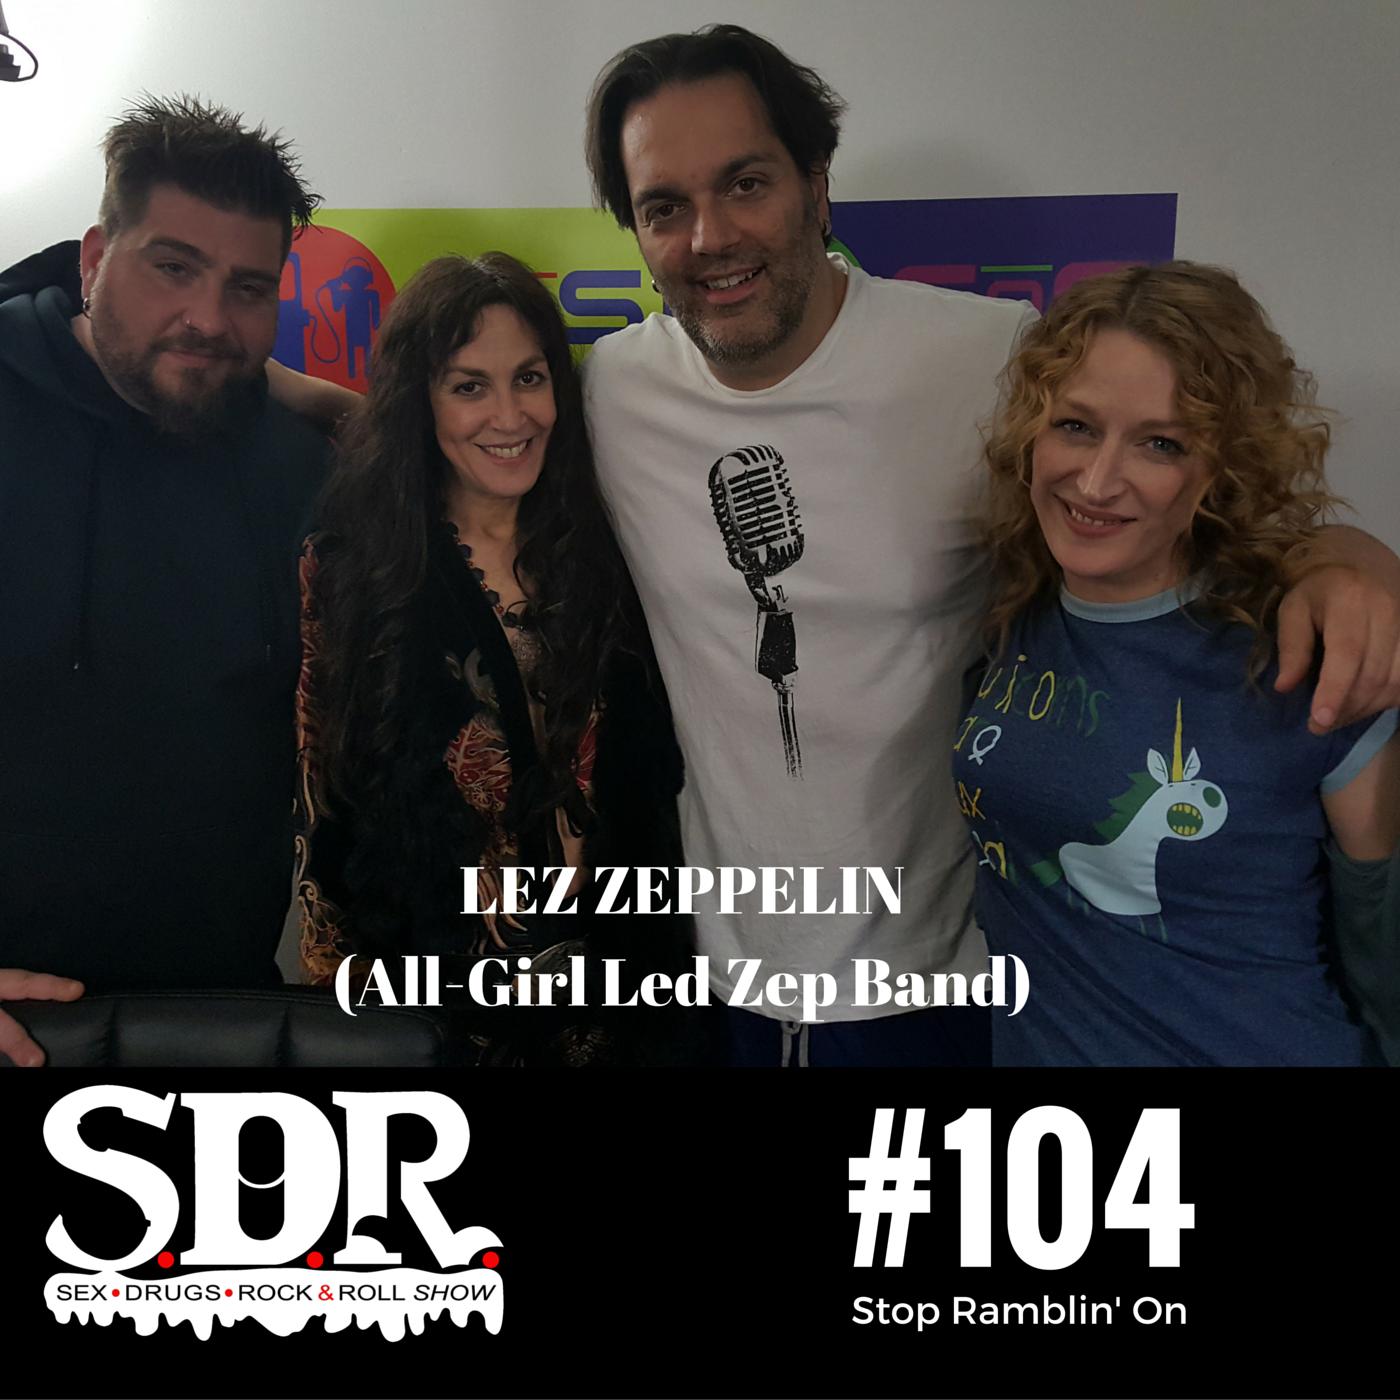 SDR #104 Lez Zeppelin - Stop Ramblin' On